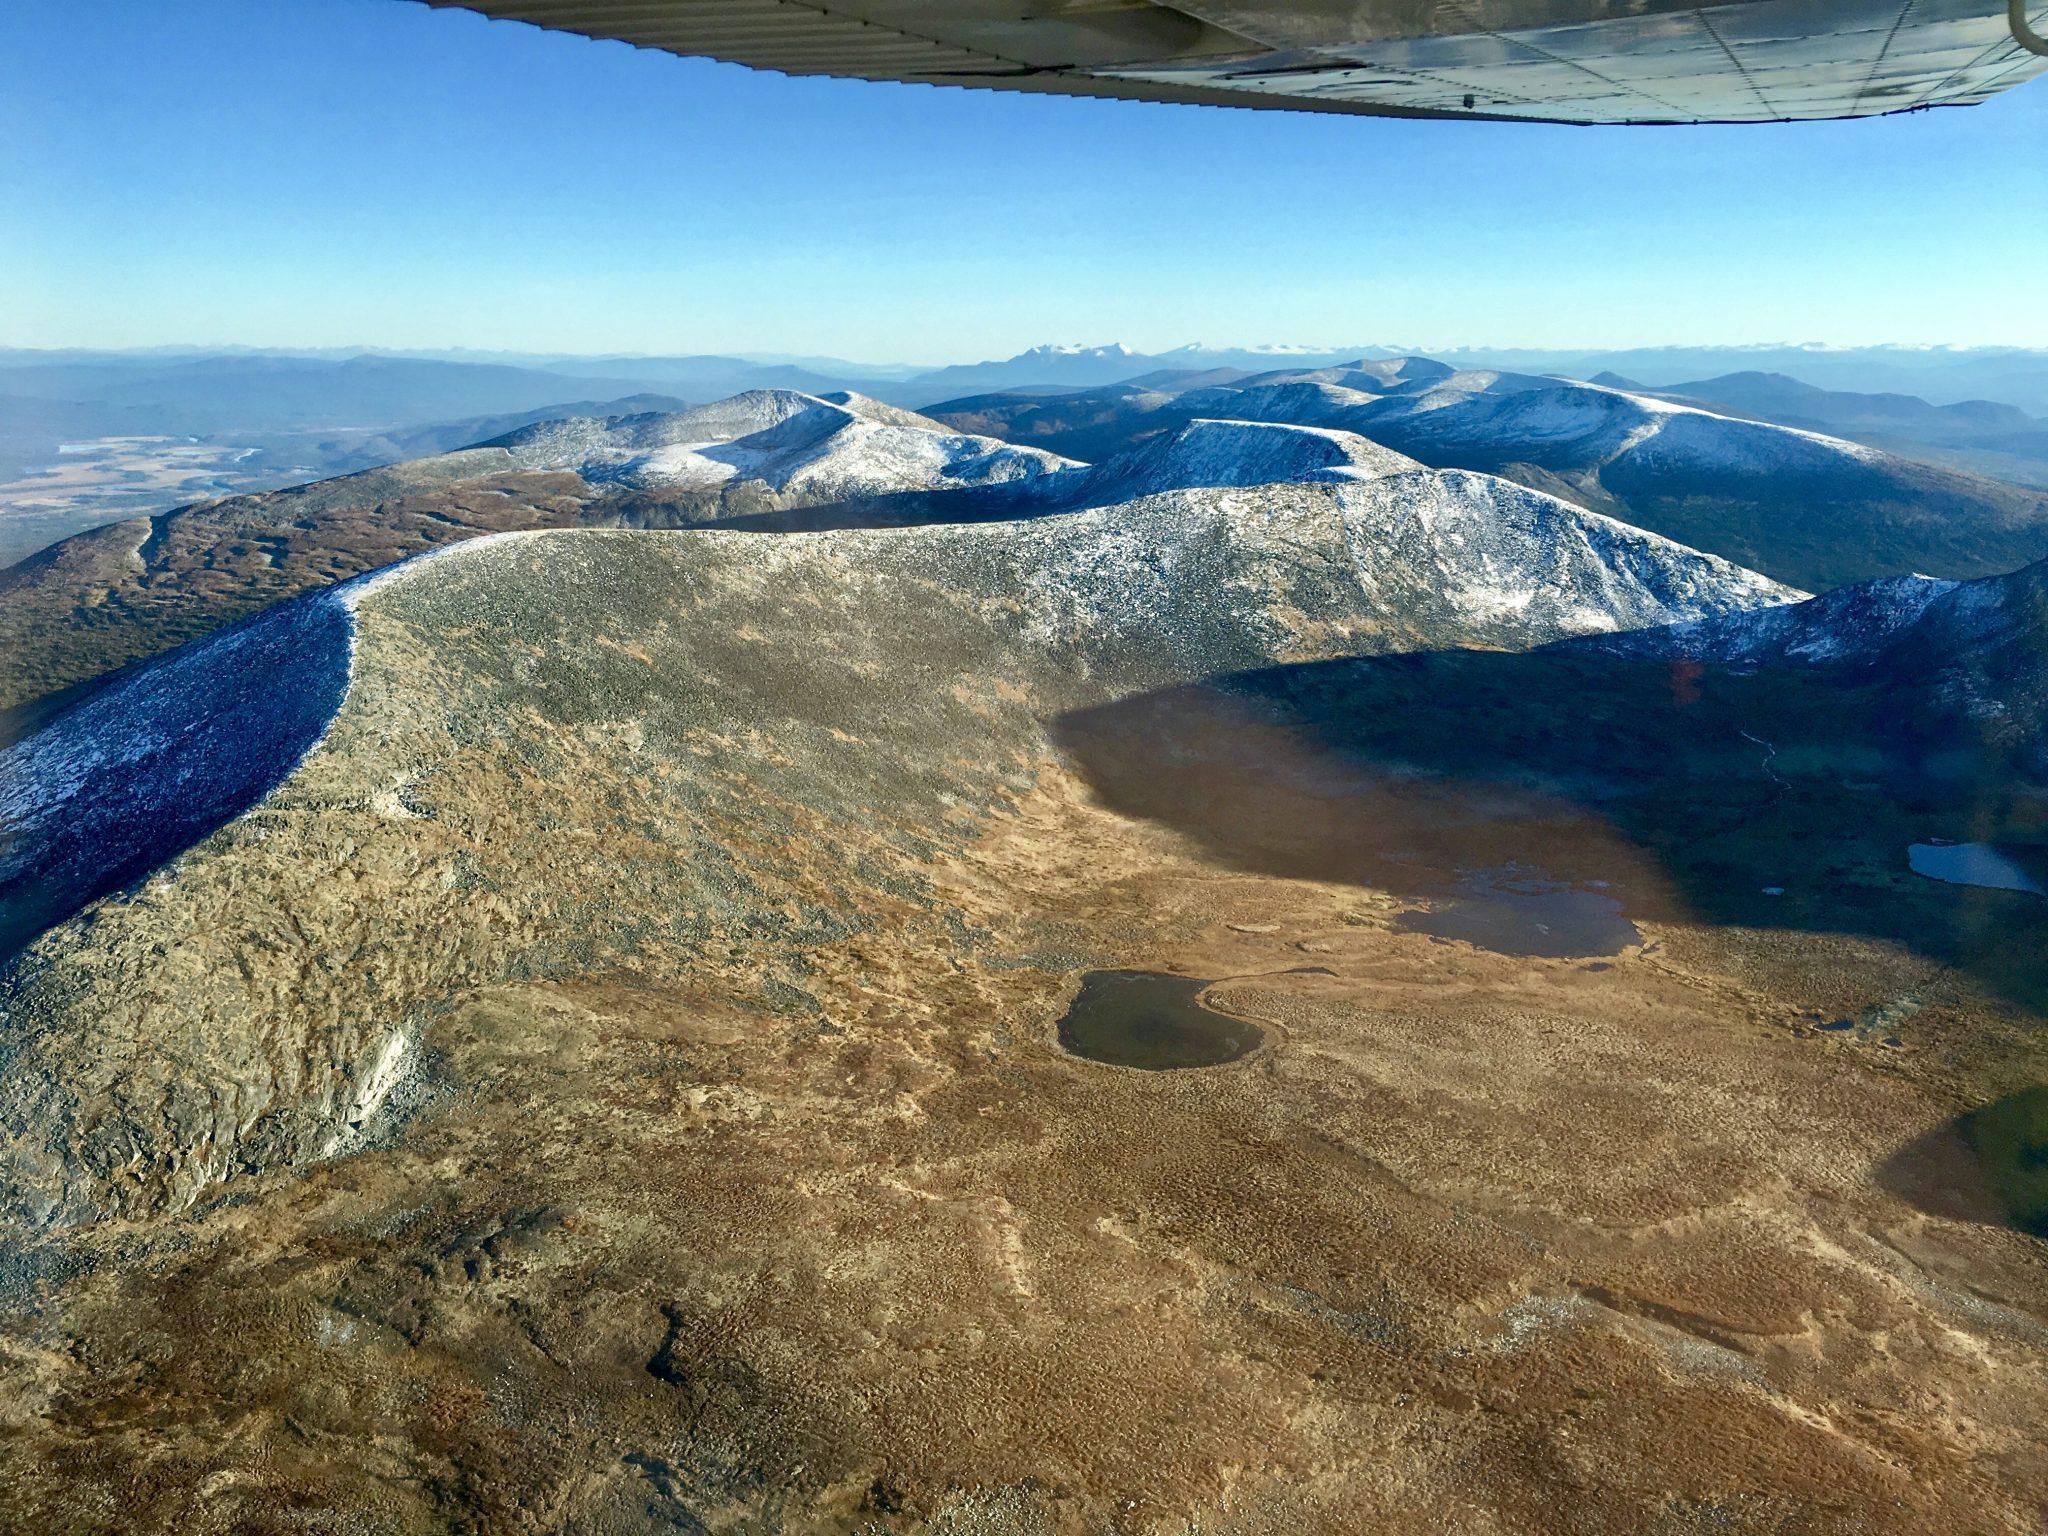 Alaska Trip Day 5: Prince George BC – Whitehorse BC